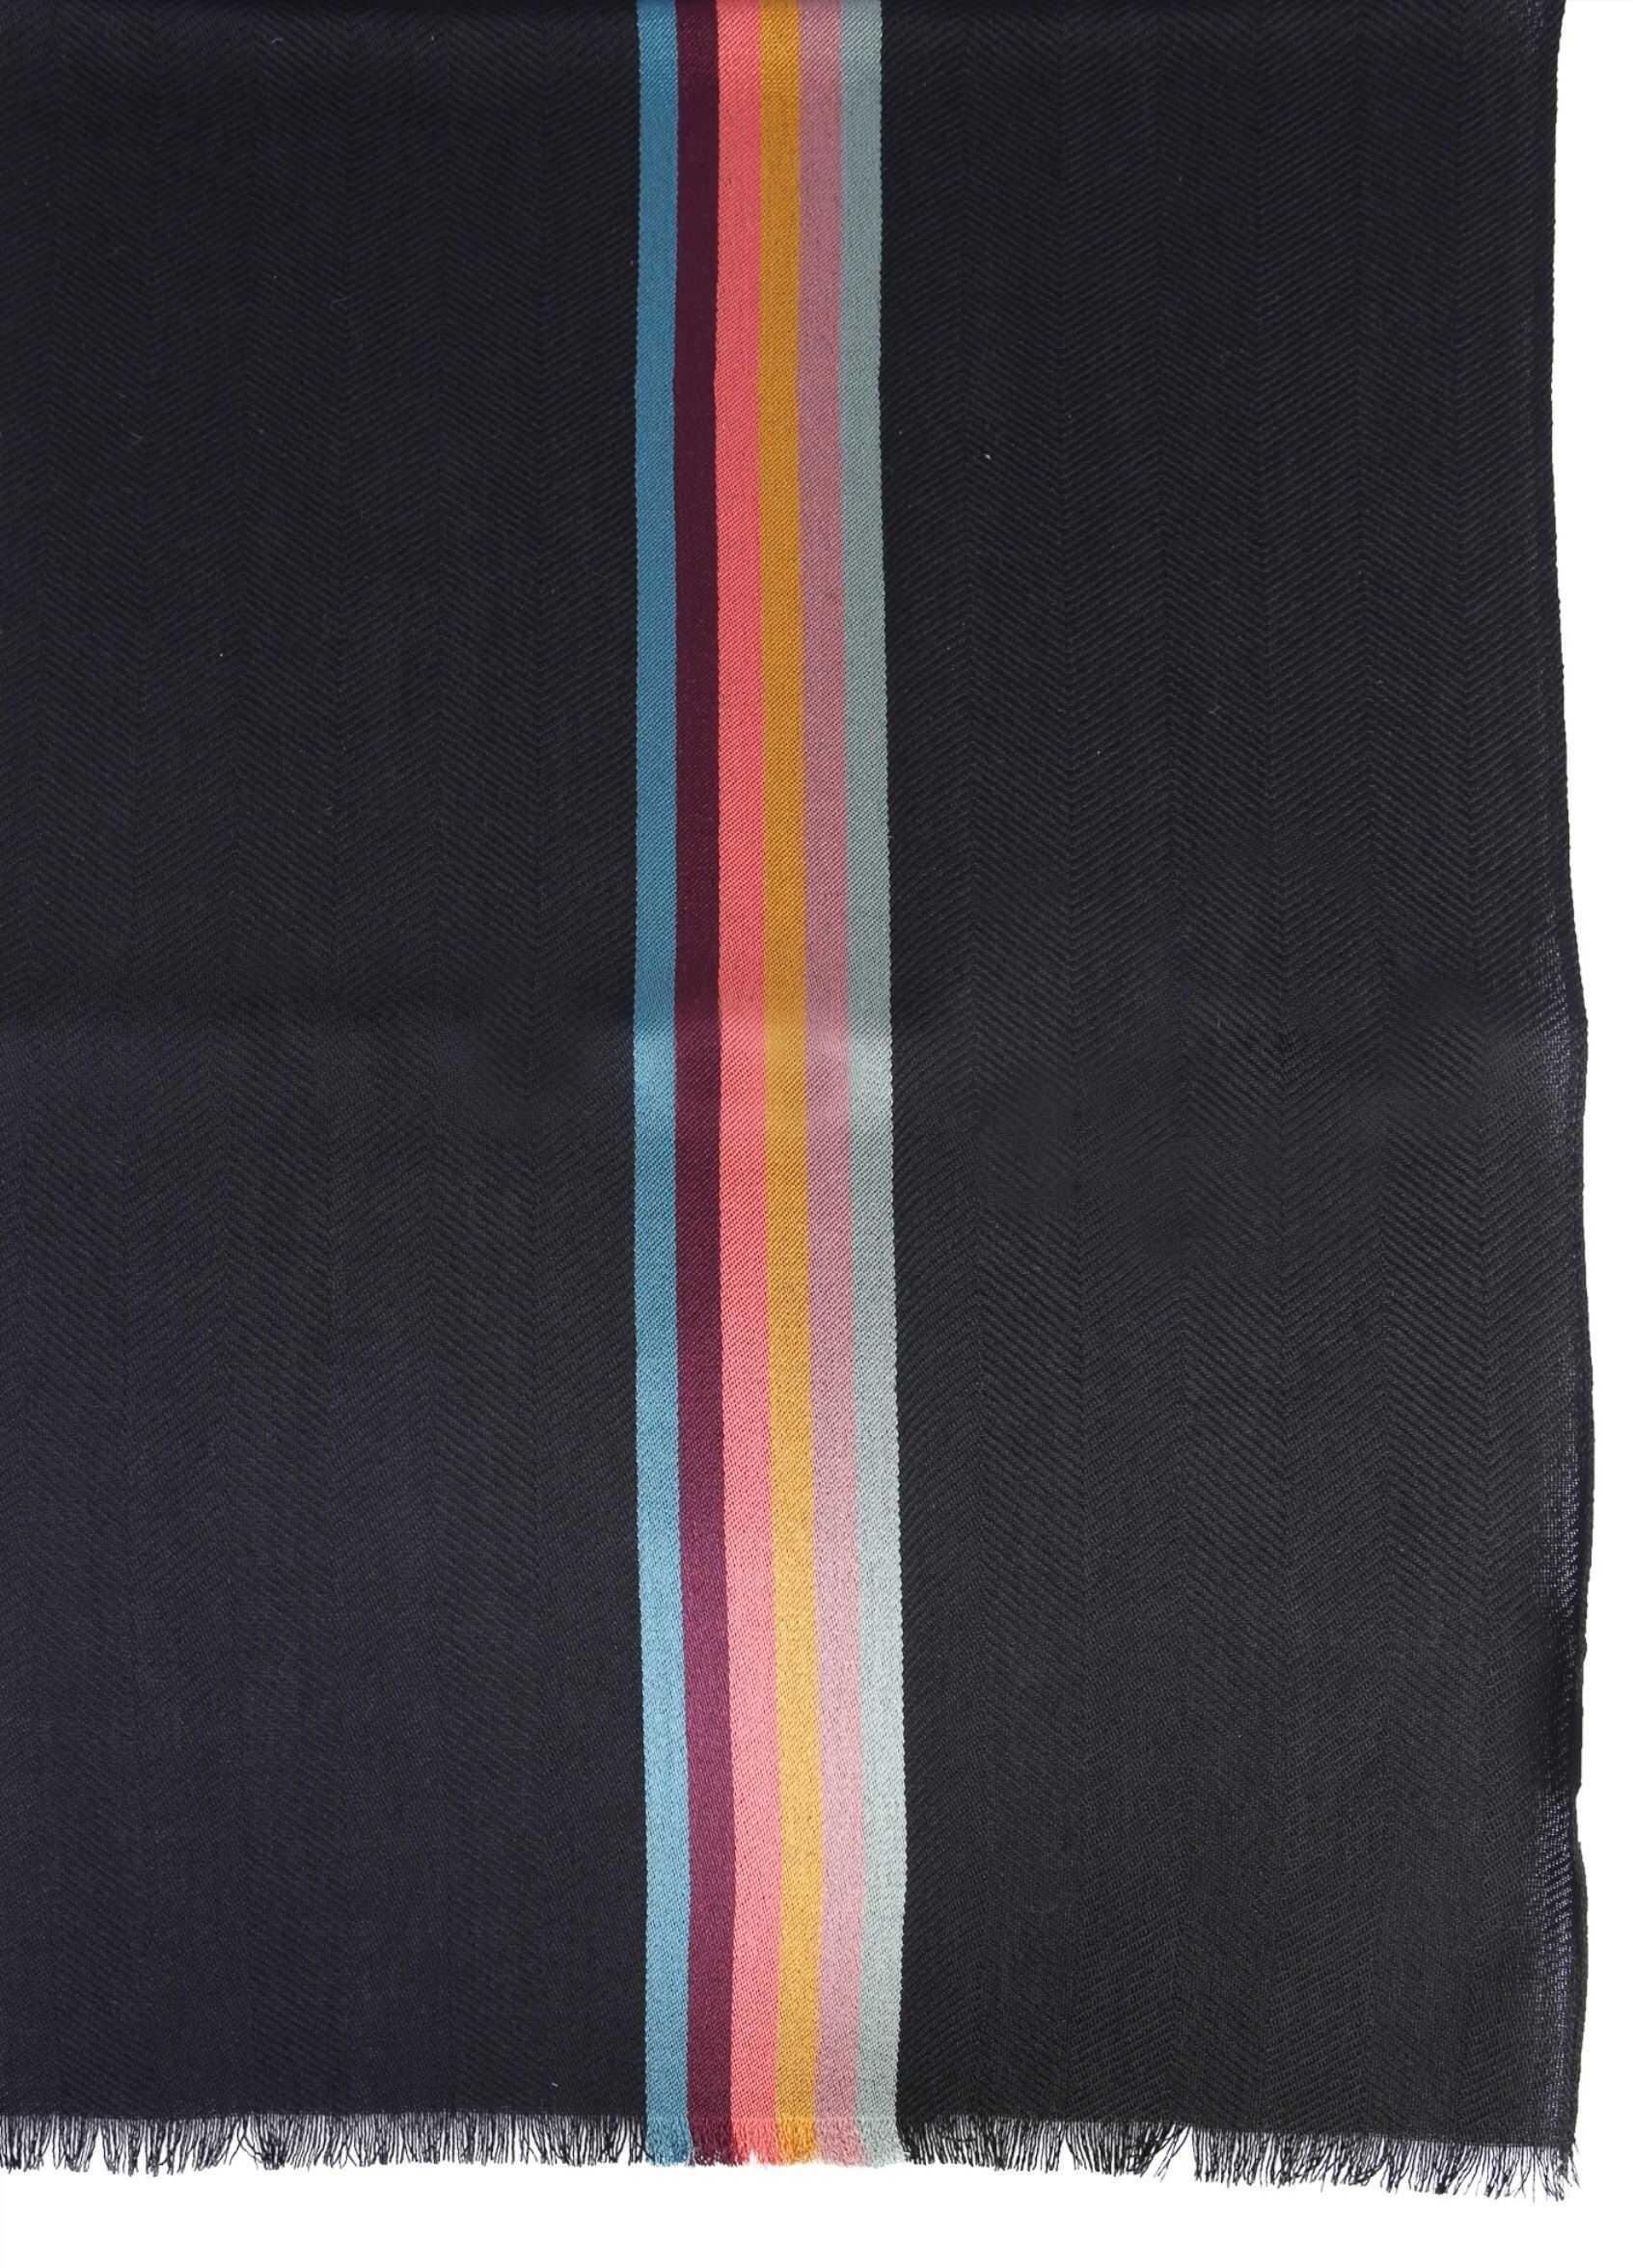 Paul Smith Wool And Silk Scarf BLACK